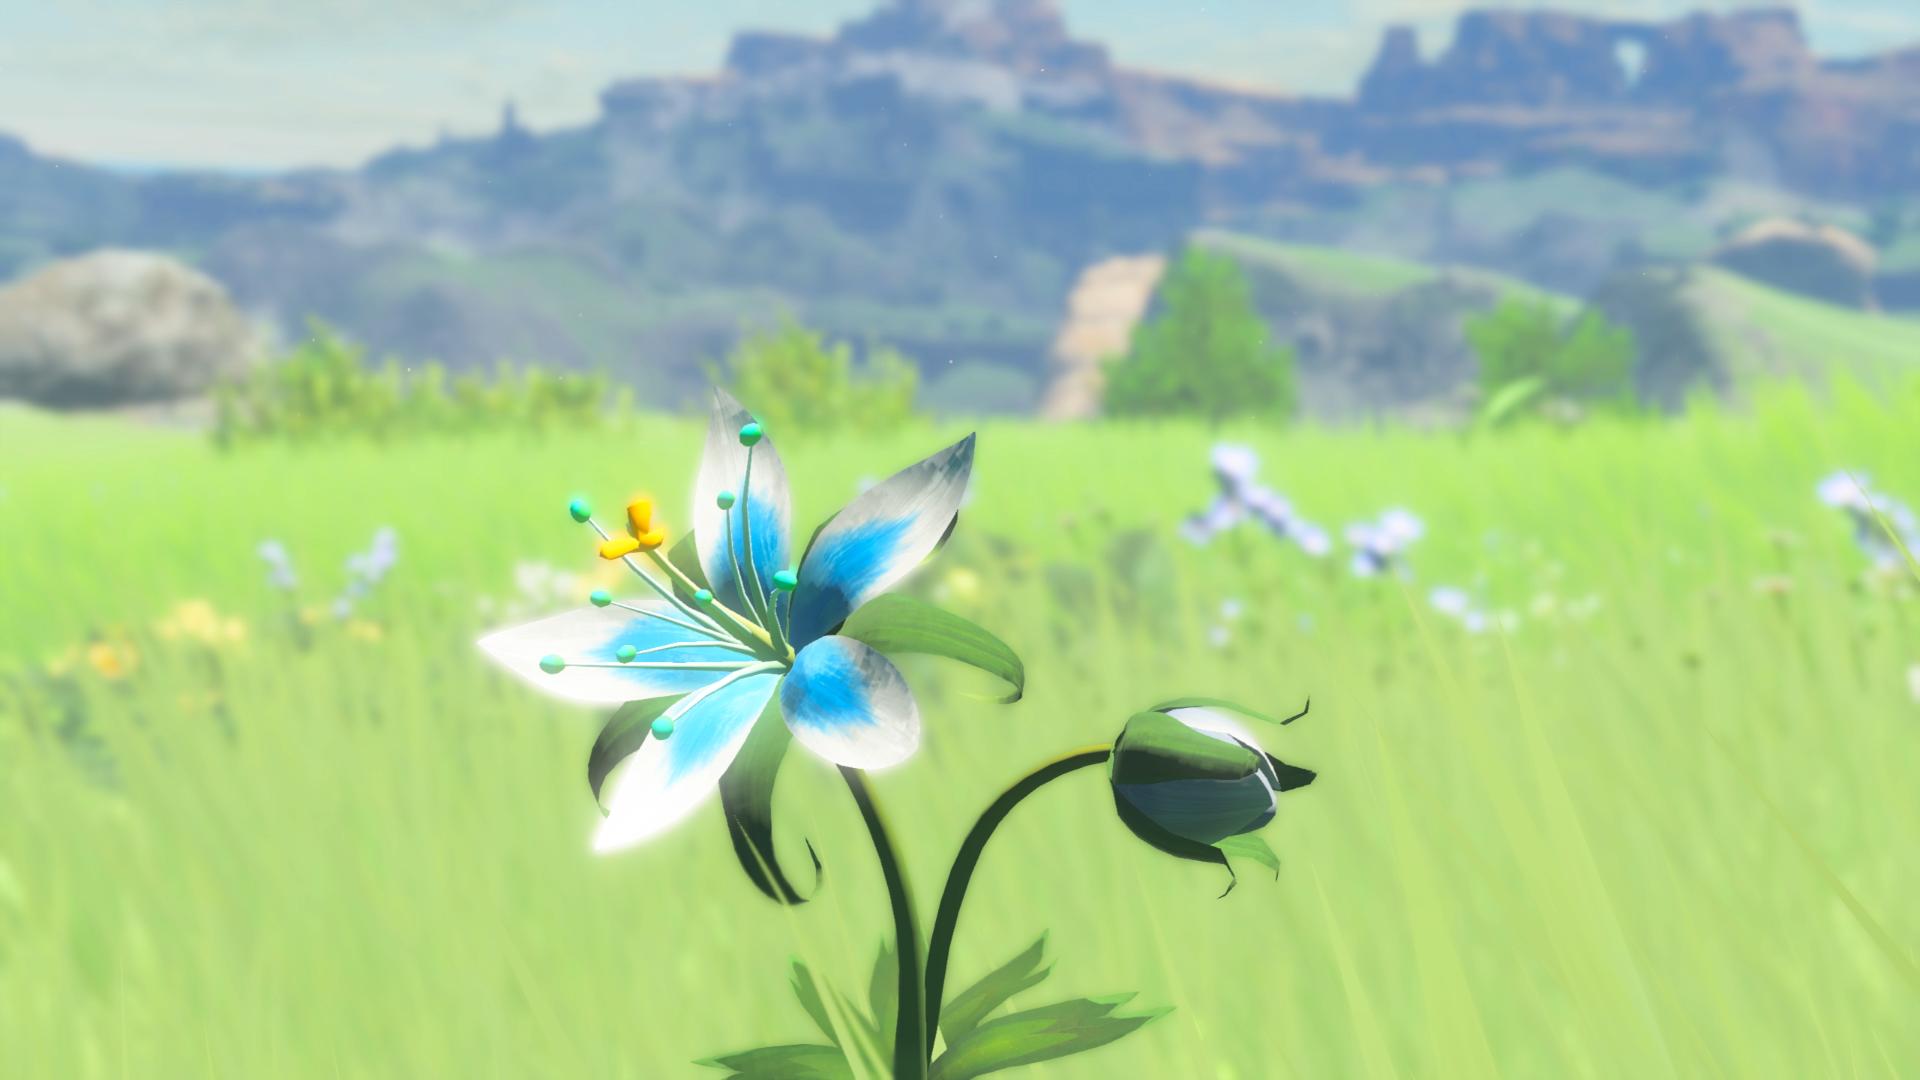 The Legend of Zelda: Breath of the Wild image 31